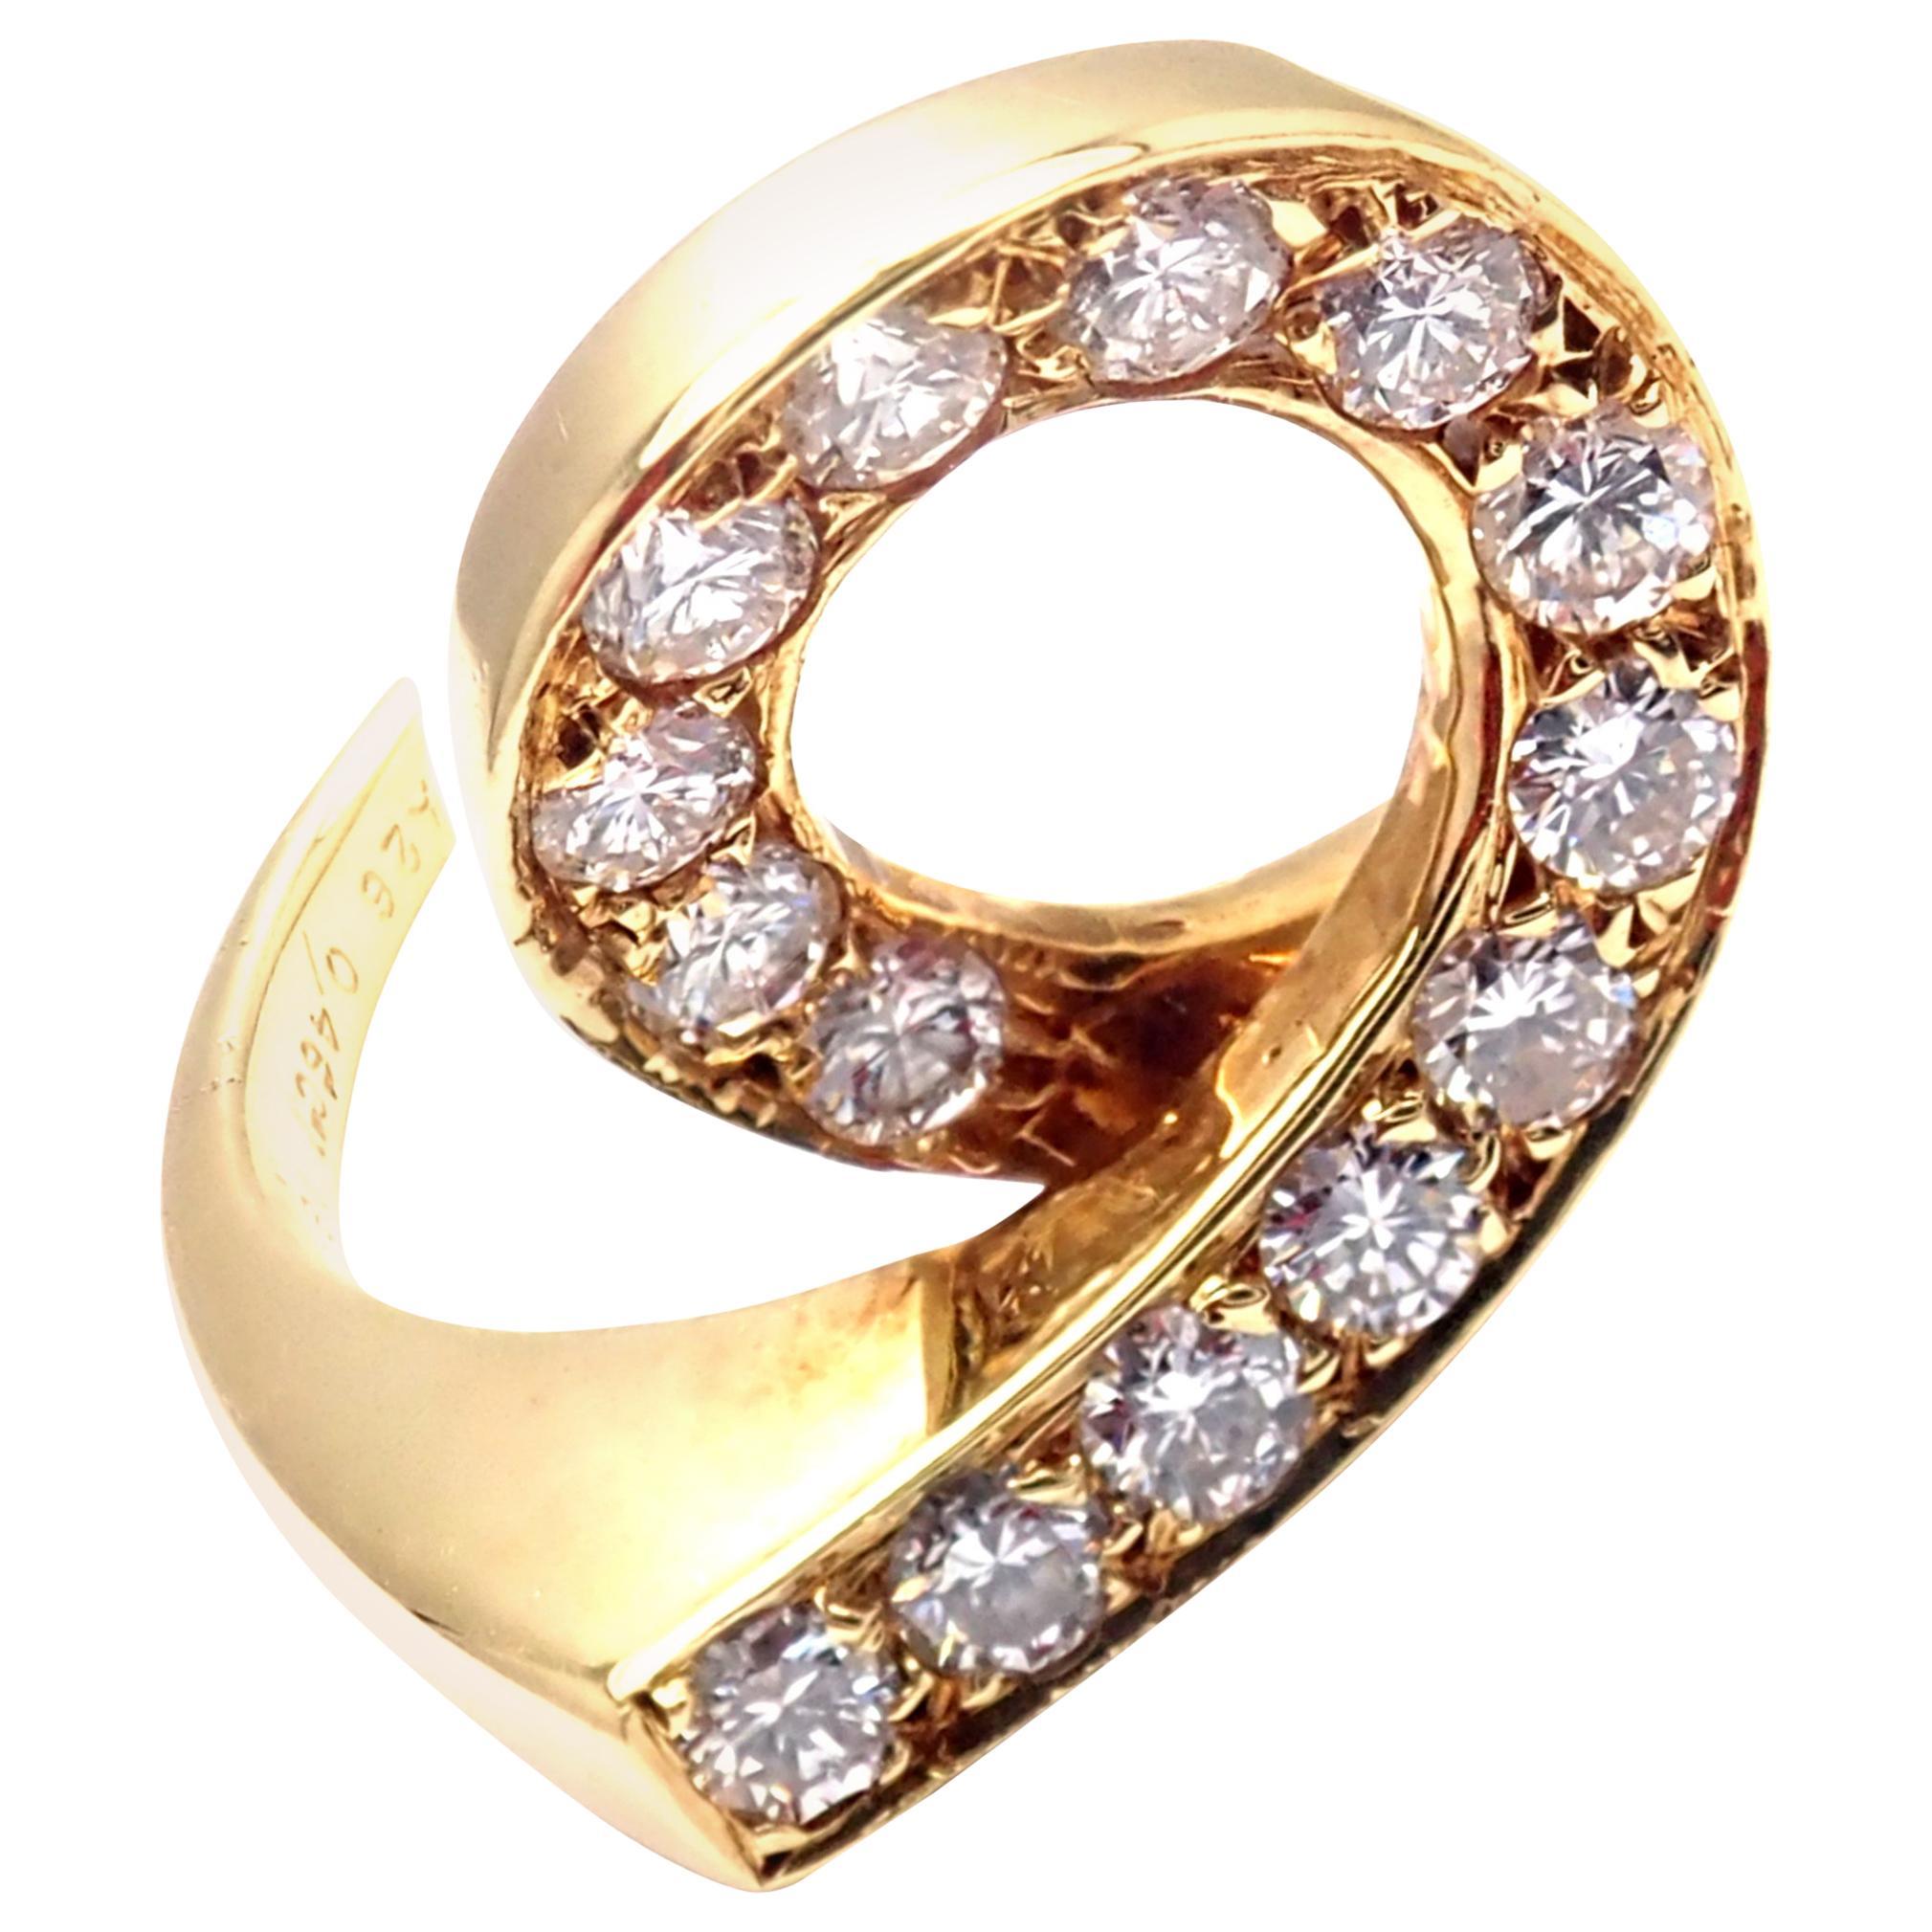 Vintage Van Cleef & Arpels Diamond Swirl Yellow Gold Band Ring